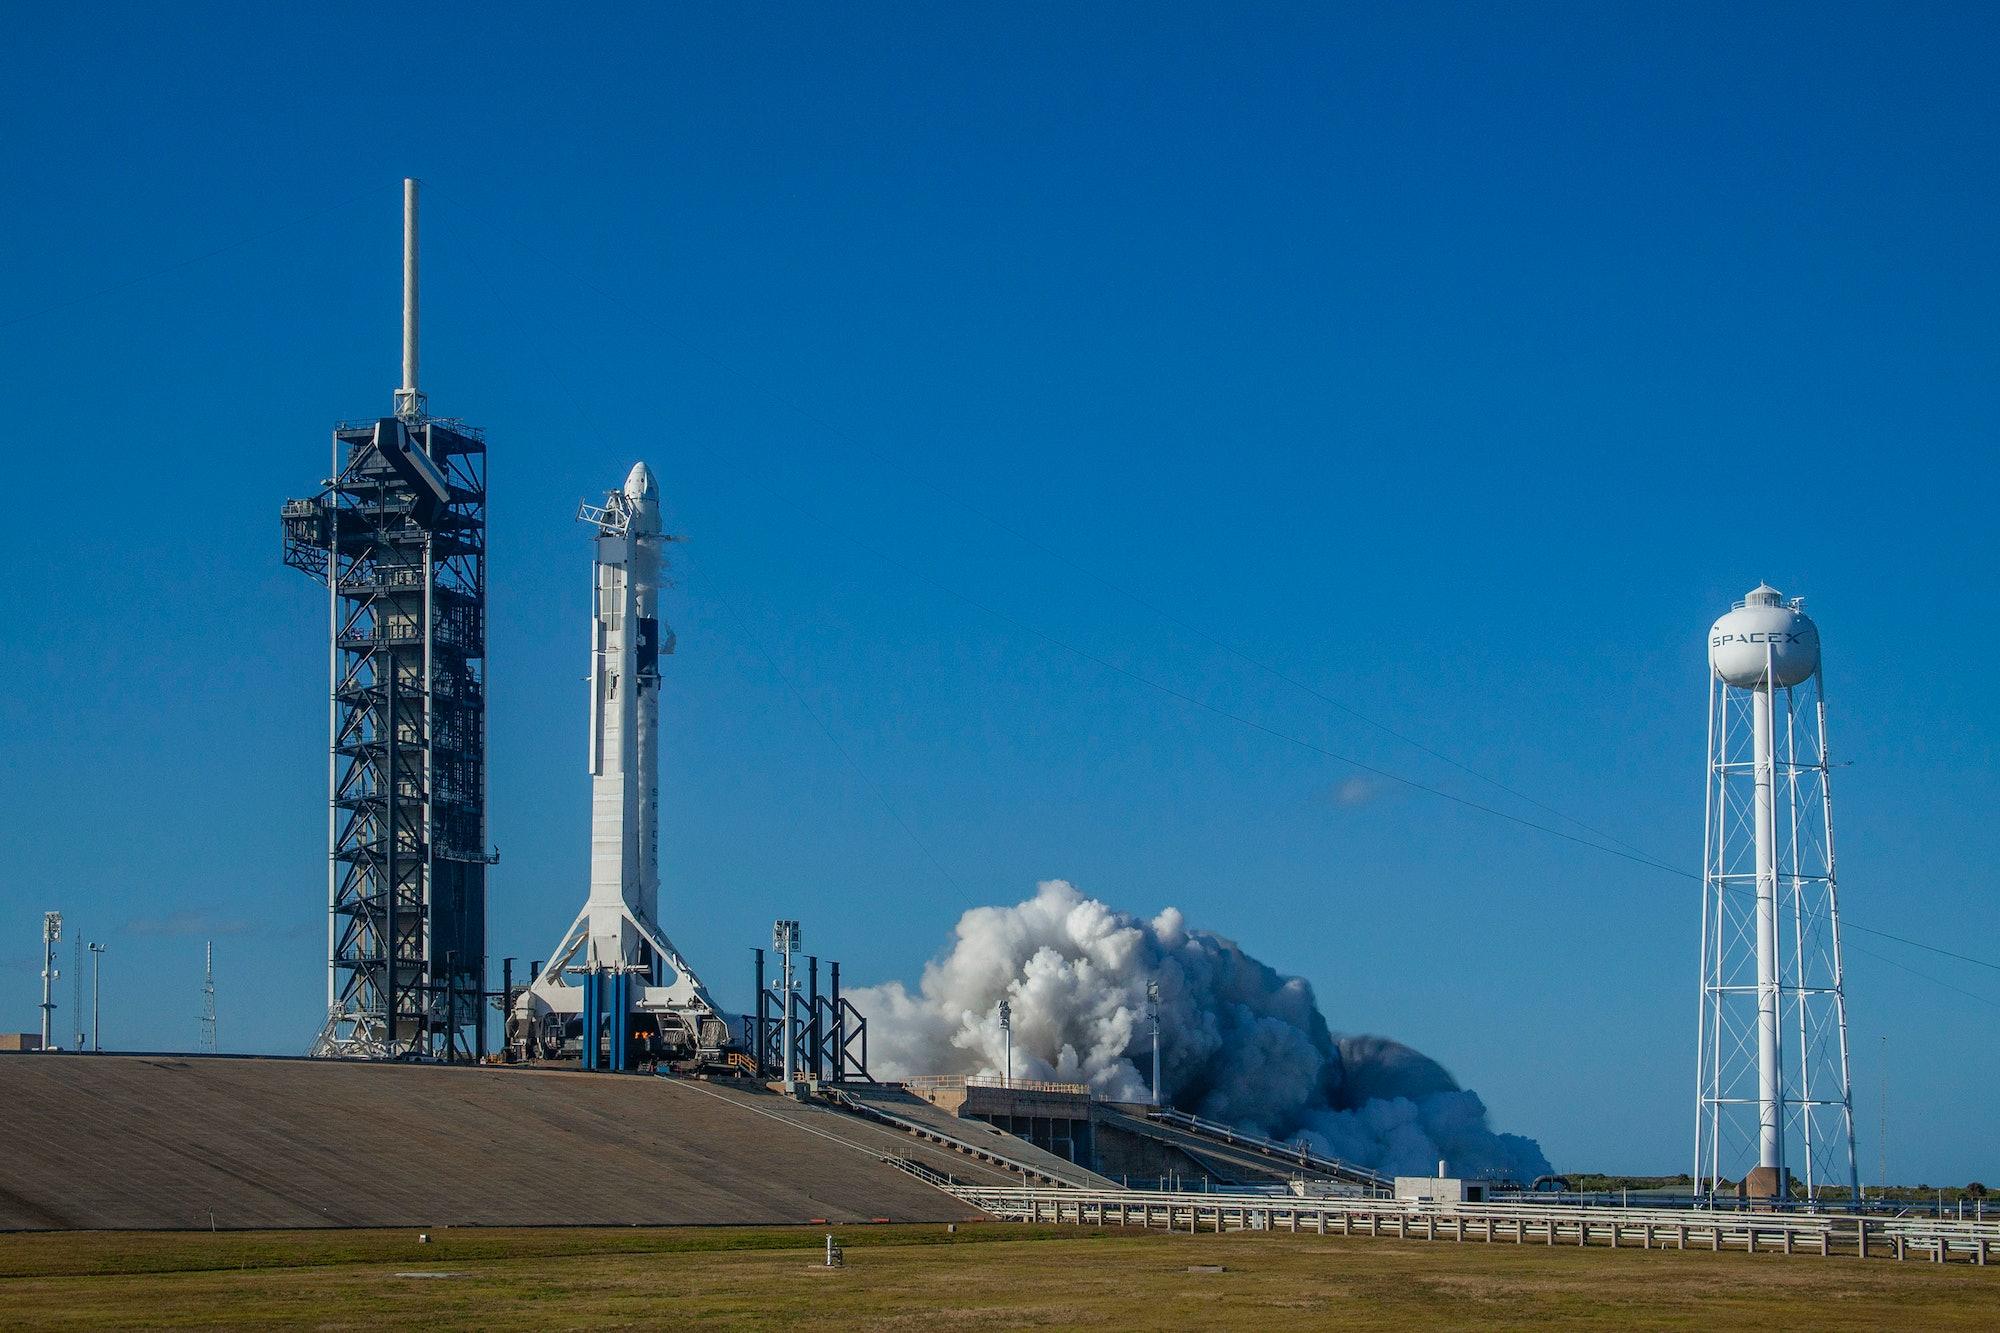 spacex falcon 9 crew dragon static fire test.